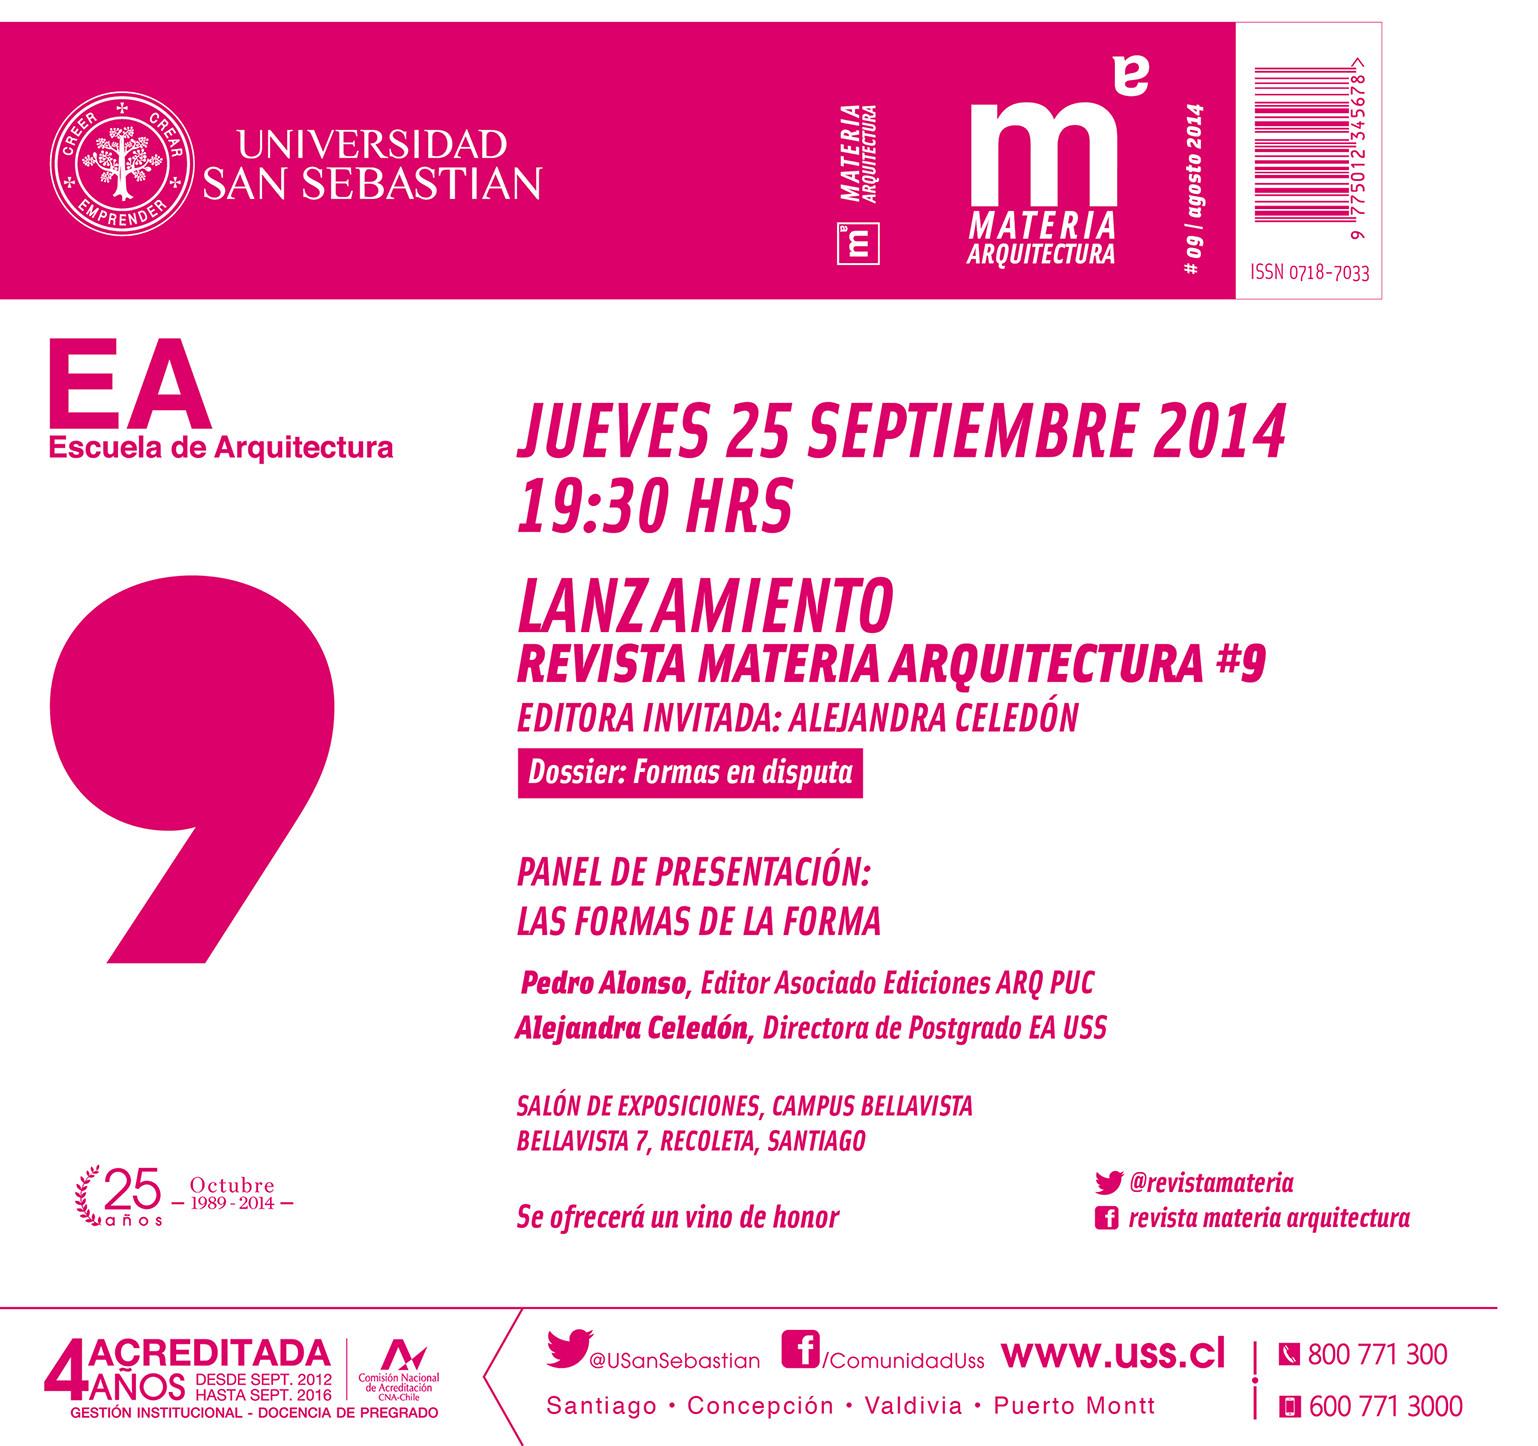 Lanzamiento revista Materia Arquitectura #9, Cortesia de Revista Materia Arquitectura